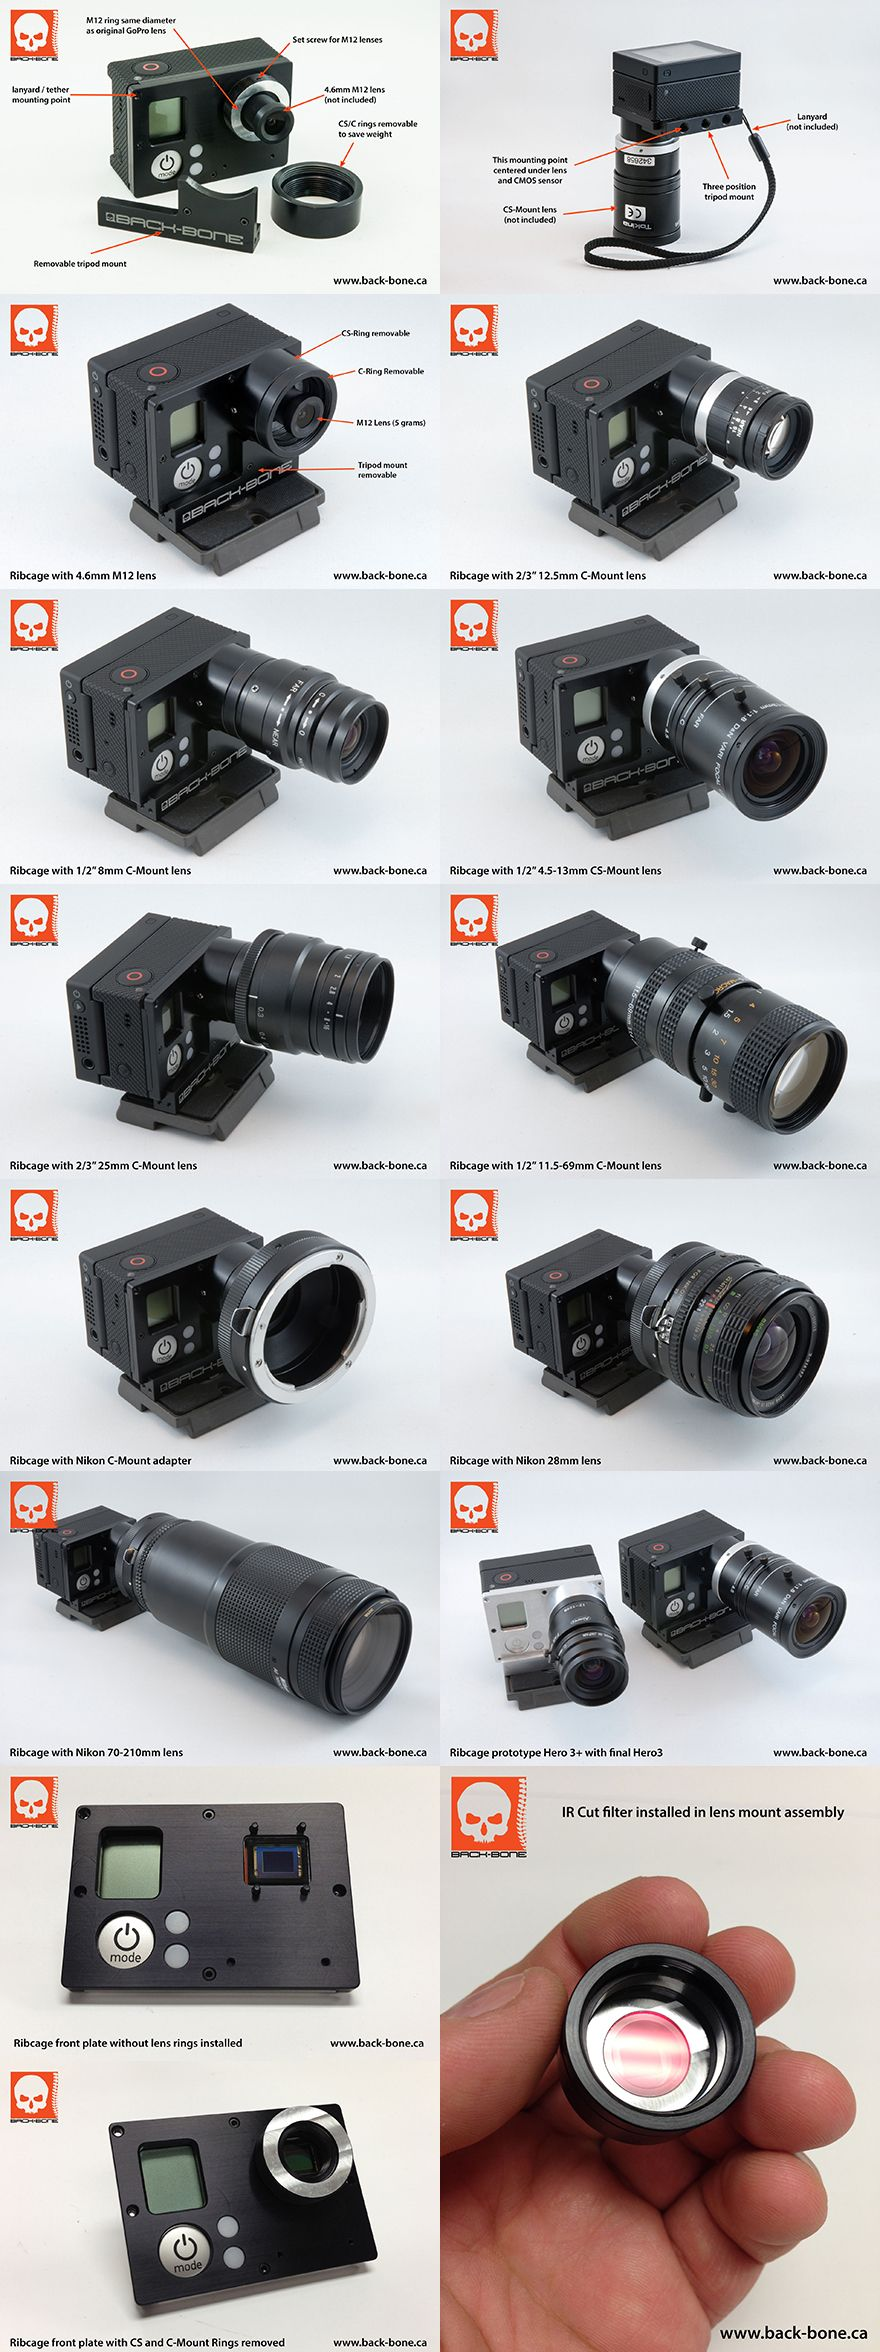 Превращение экшен-камеры GoPro 3 в фото и видеокамеру с c ...